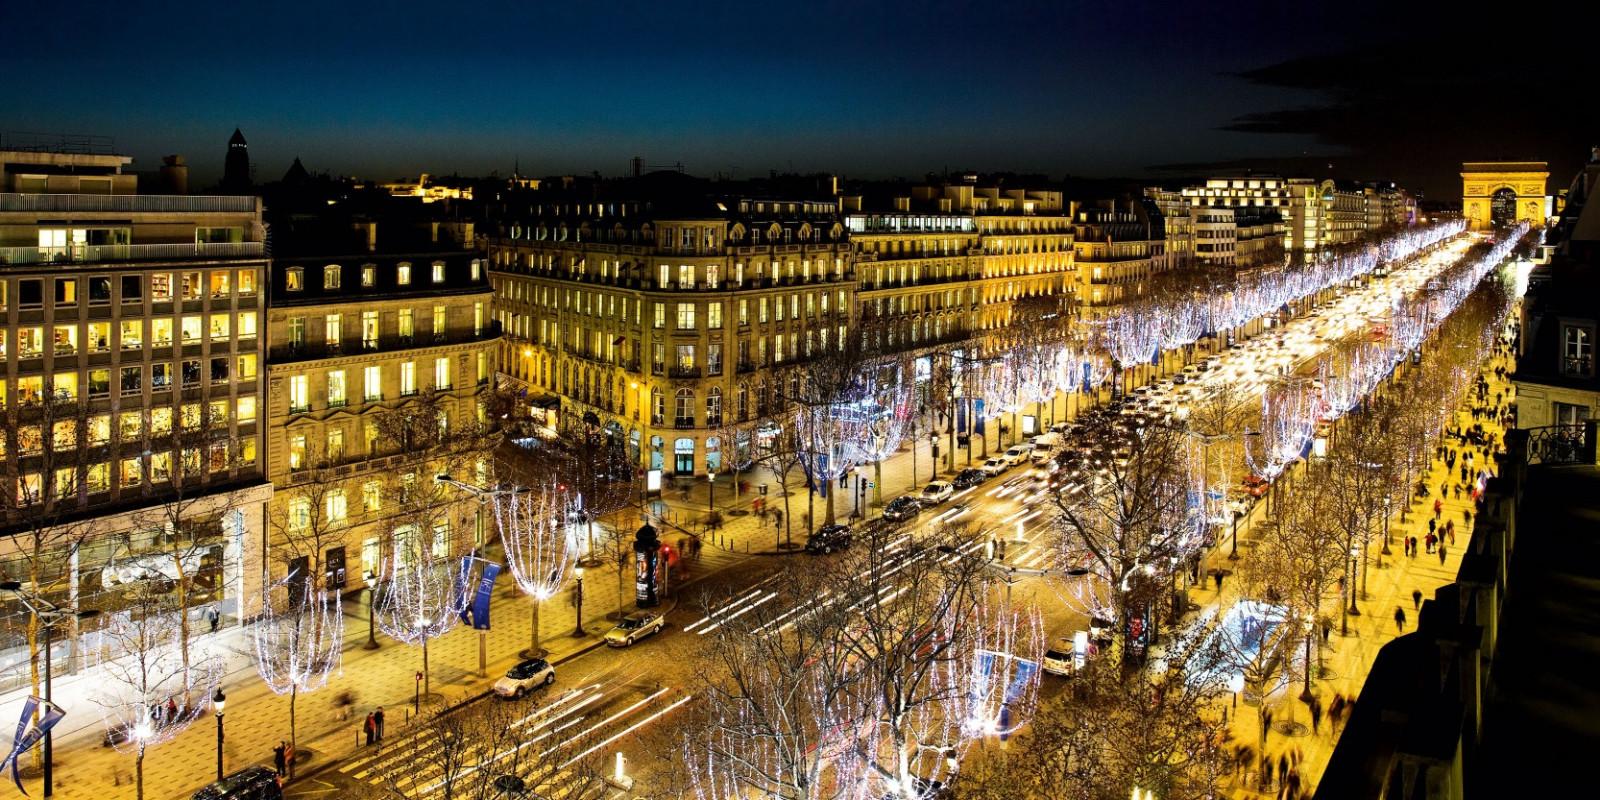 Champs Elysées Parigi - Triangolo d'oro